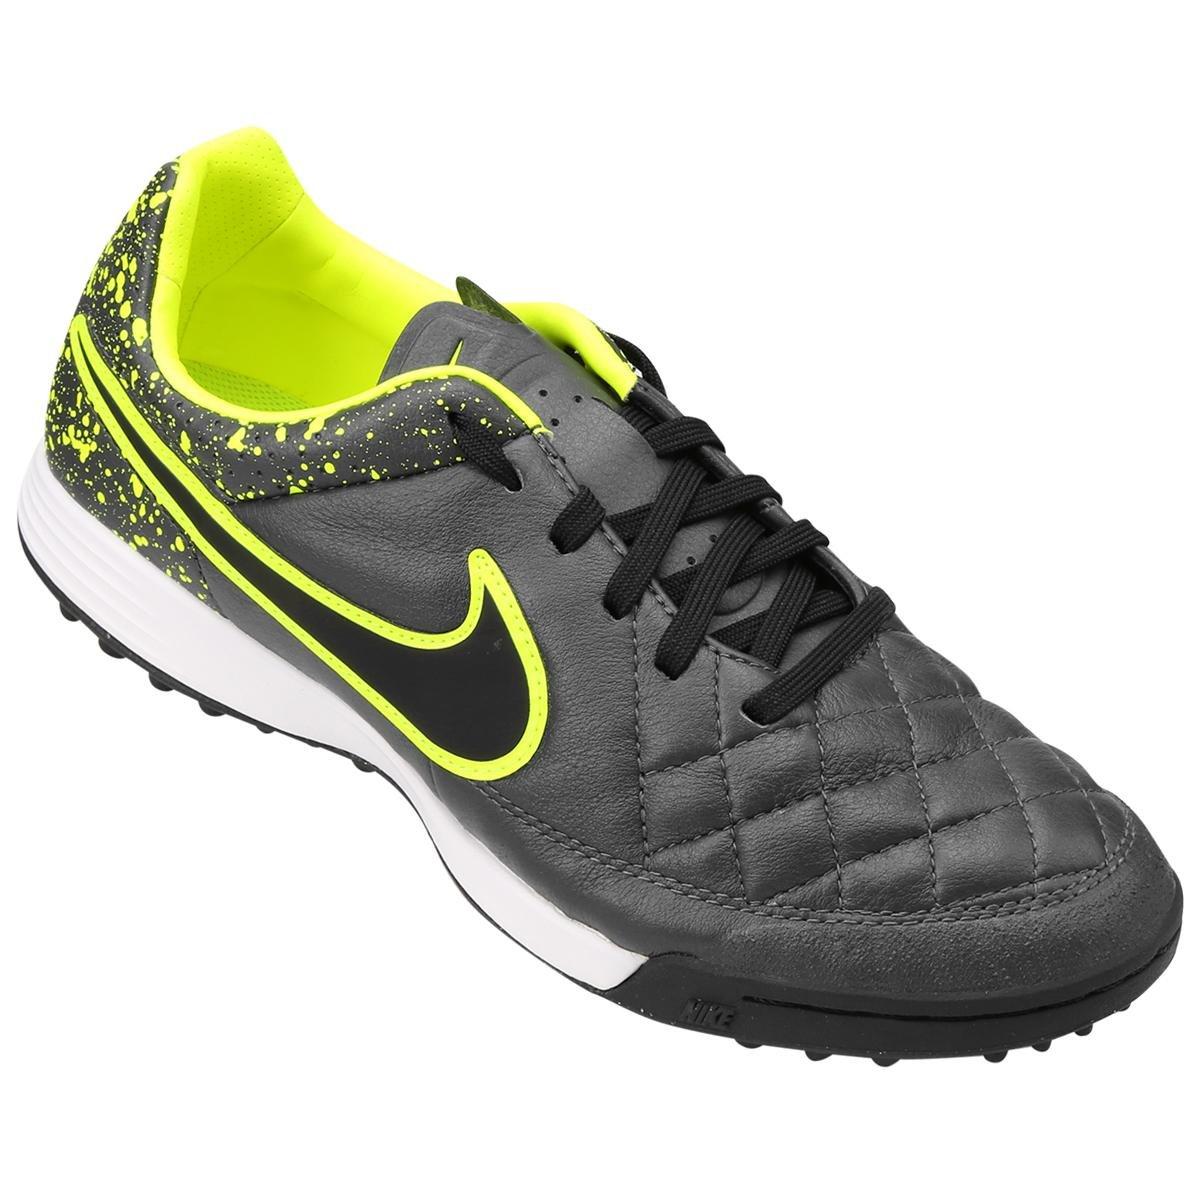 d9ddf212fbc93 Chuteira Nike Tiempo Legacy TF - Compre Agora